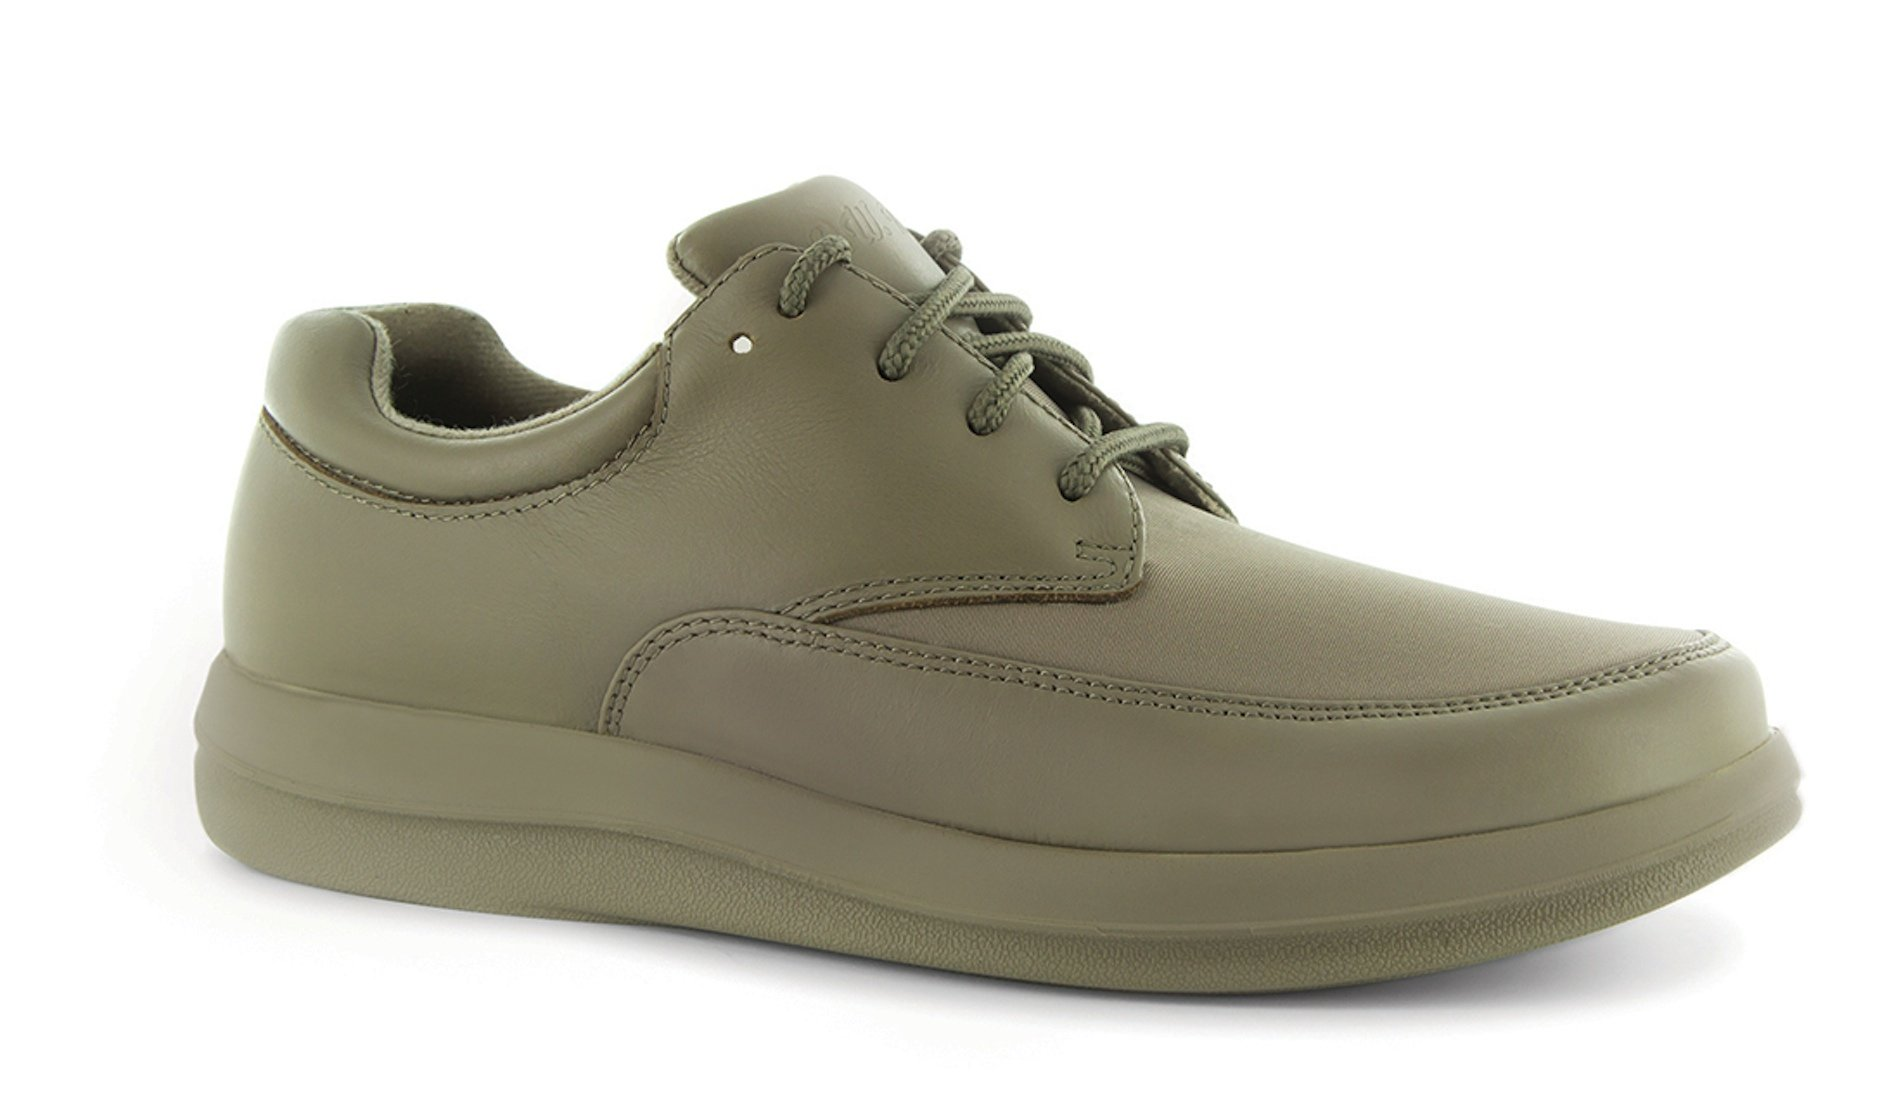 P W Minor Pleasure Women's Therapeutic Extra Depth Shoe: Taupe 7 Medium (D) Velcro by P.W. Minor